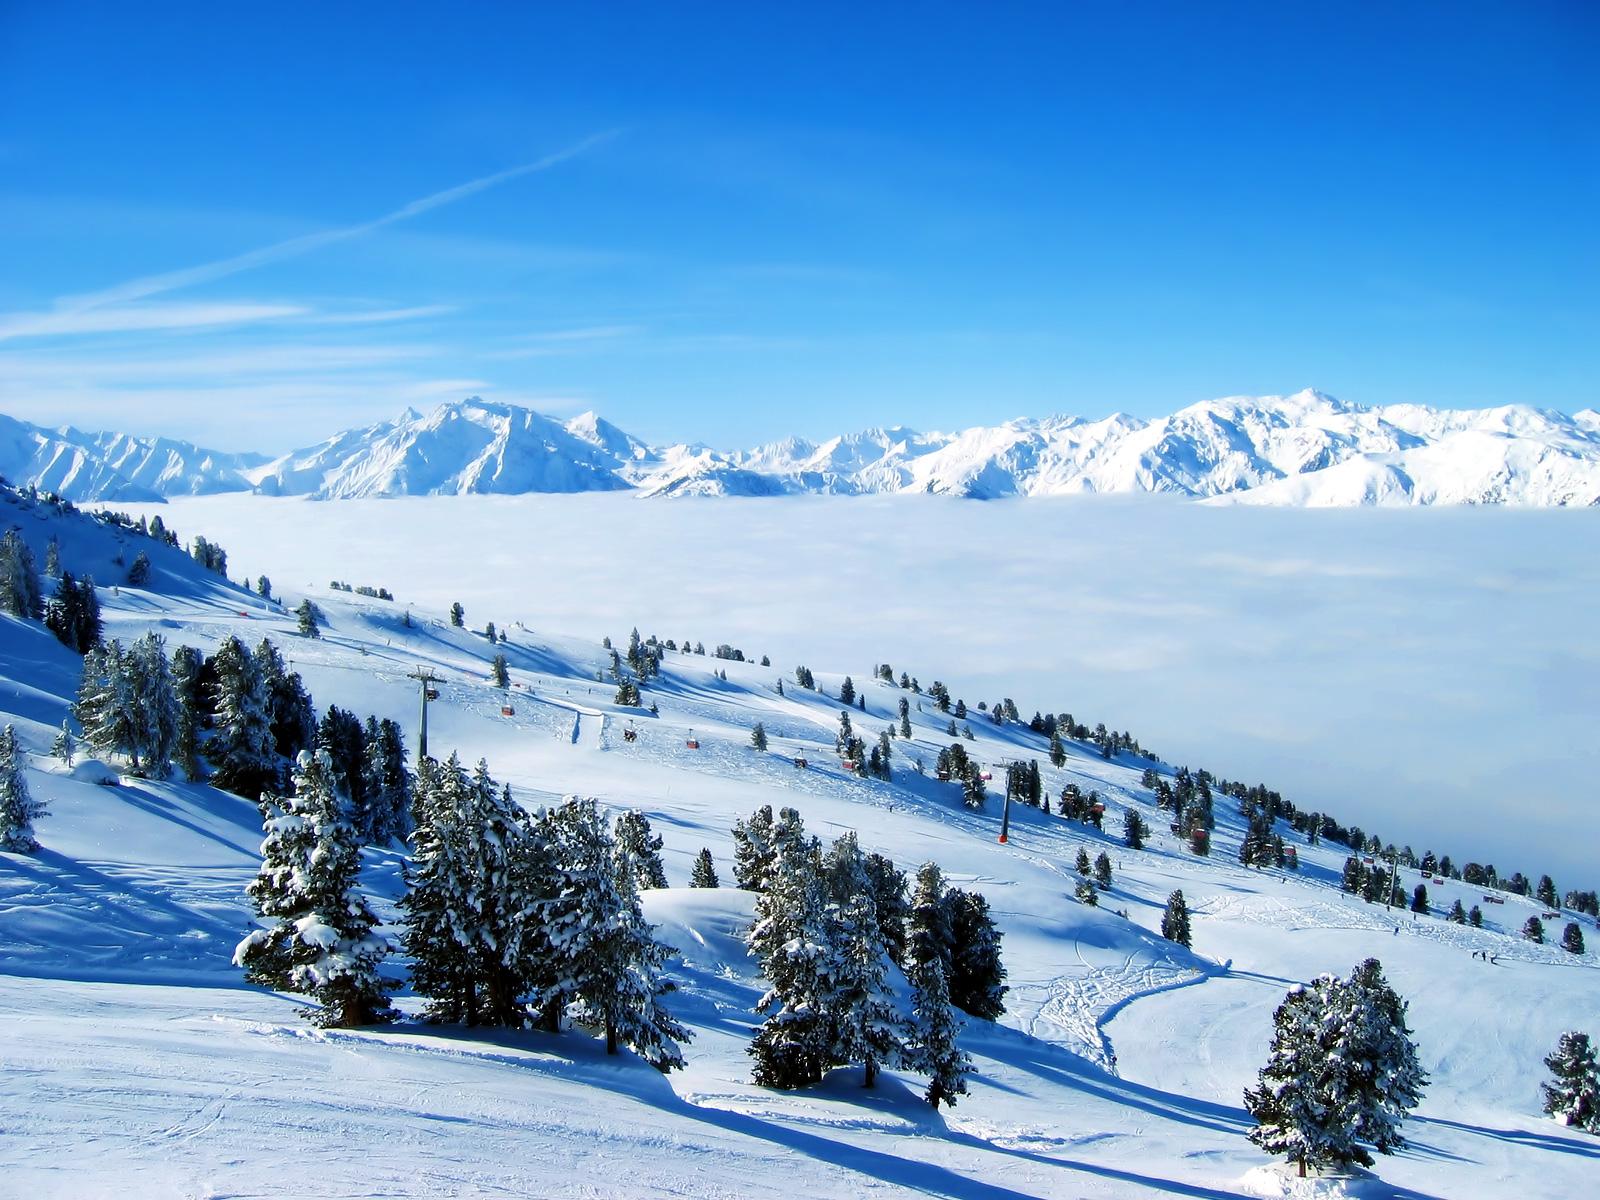 Manzaralı Kış Resimleri HD Winter Landscape Wallpapers